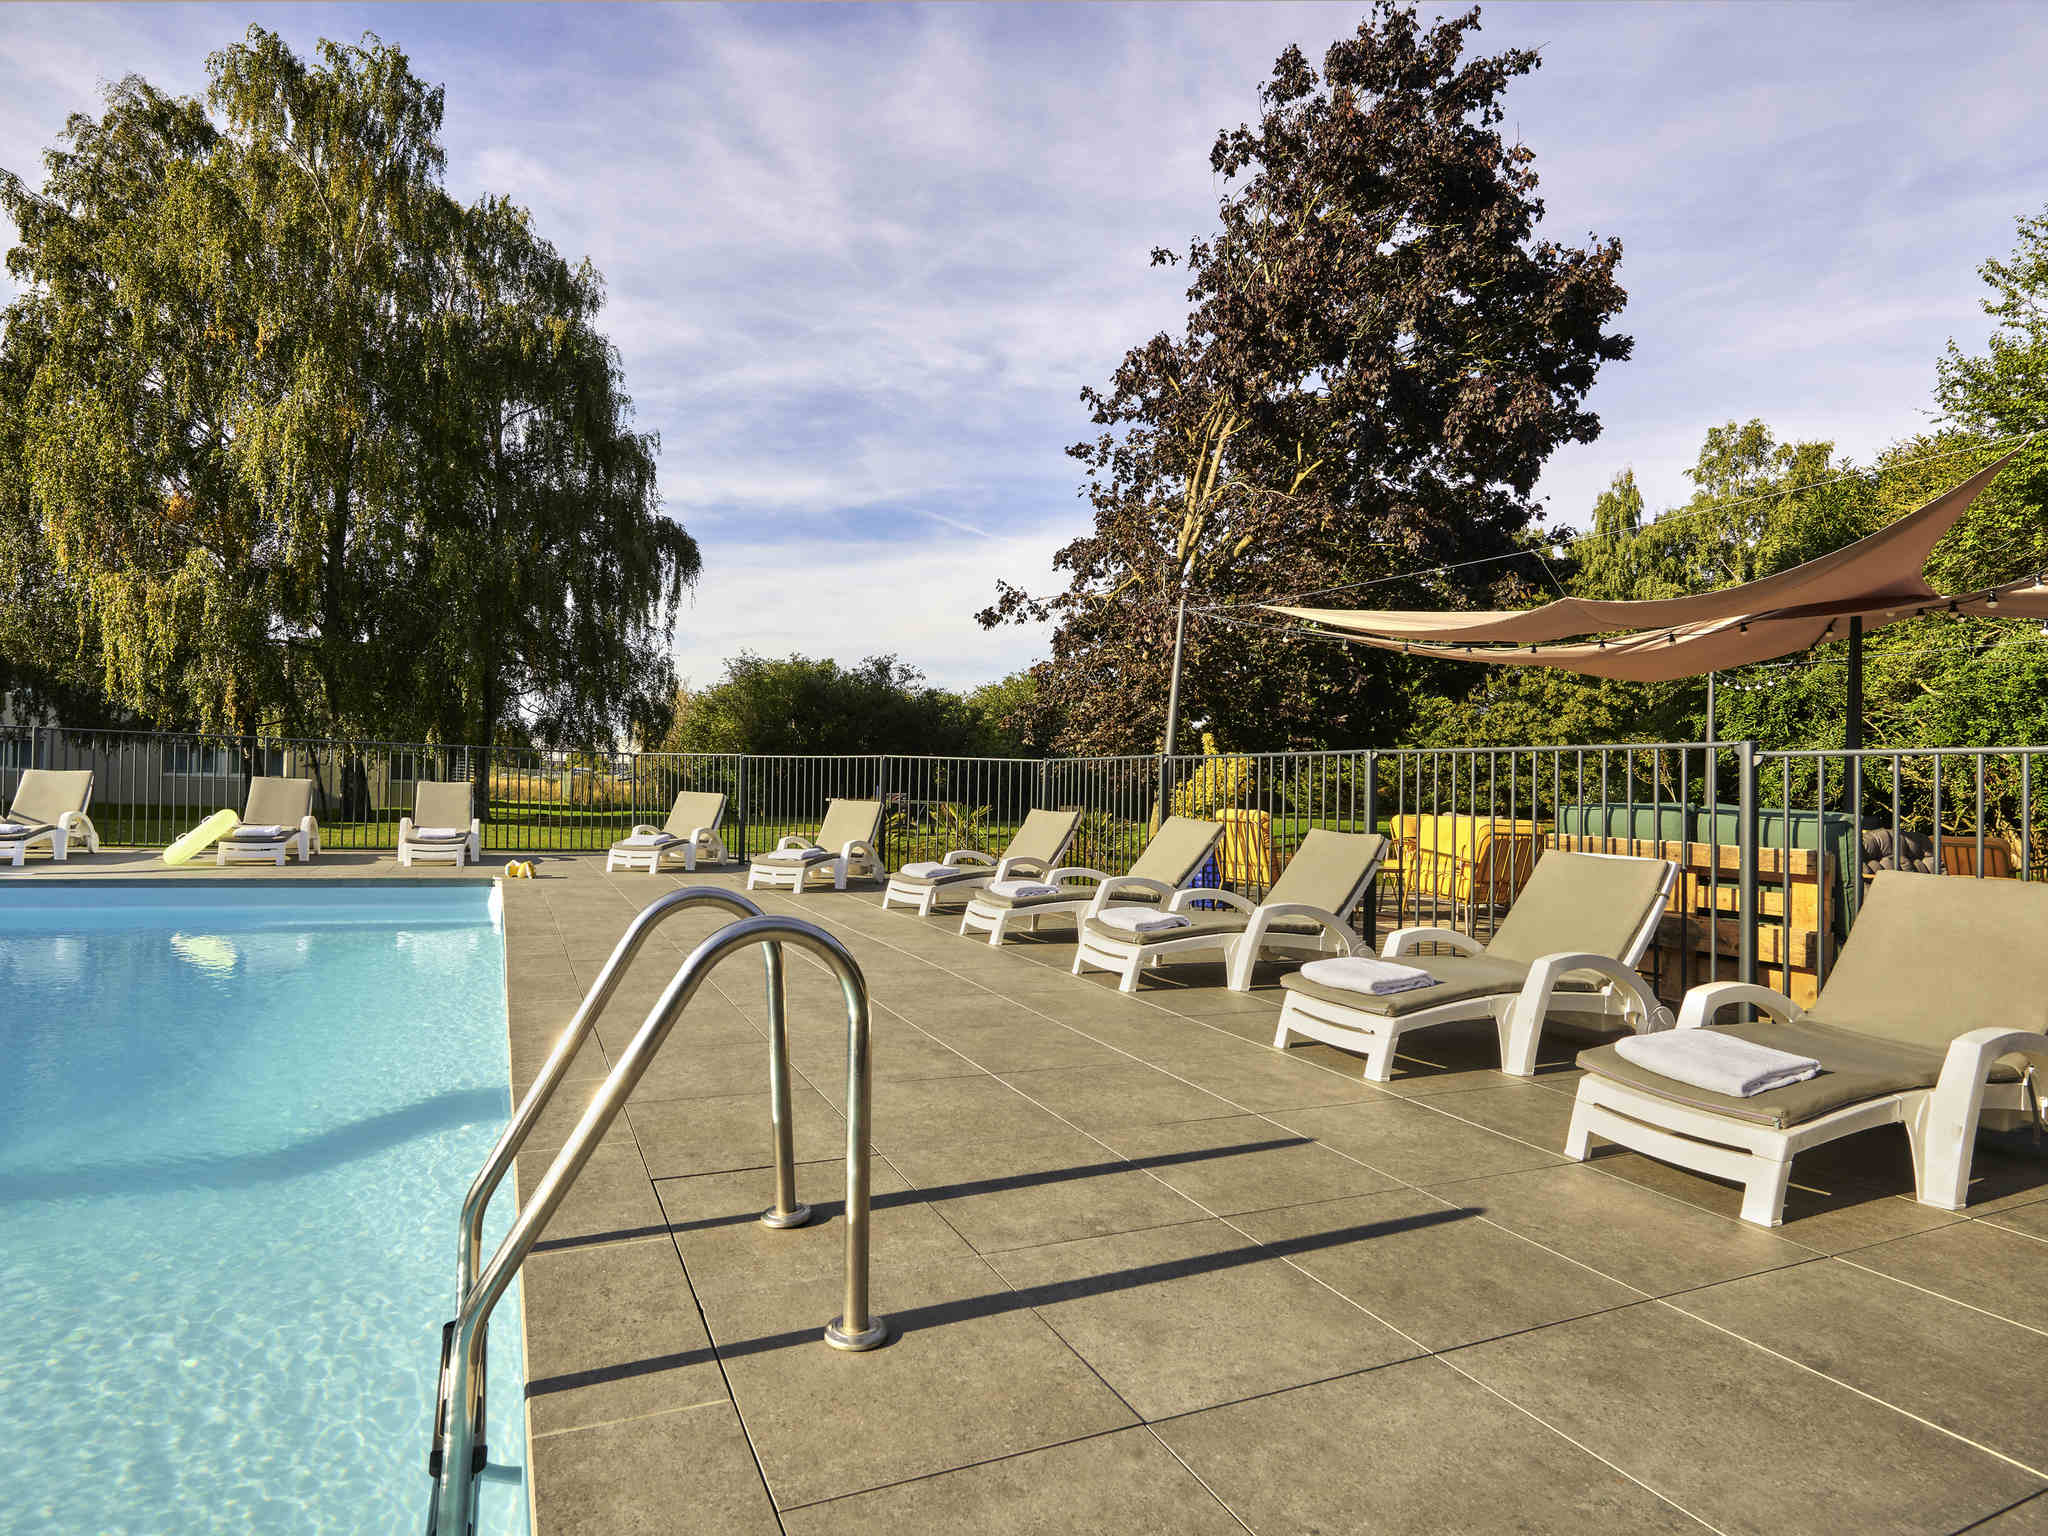 فندق - Novotel Survilliers Saint-Witz